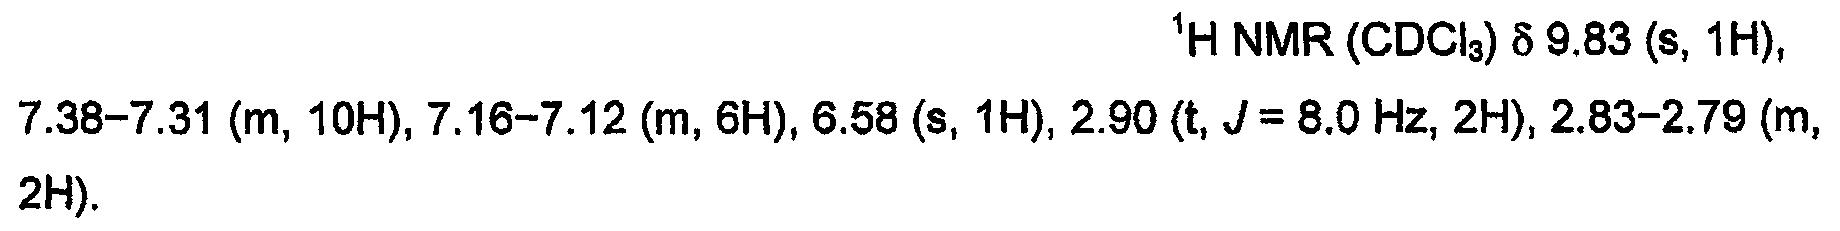 Figure 112013001840595-pat00122